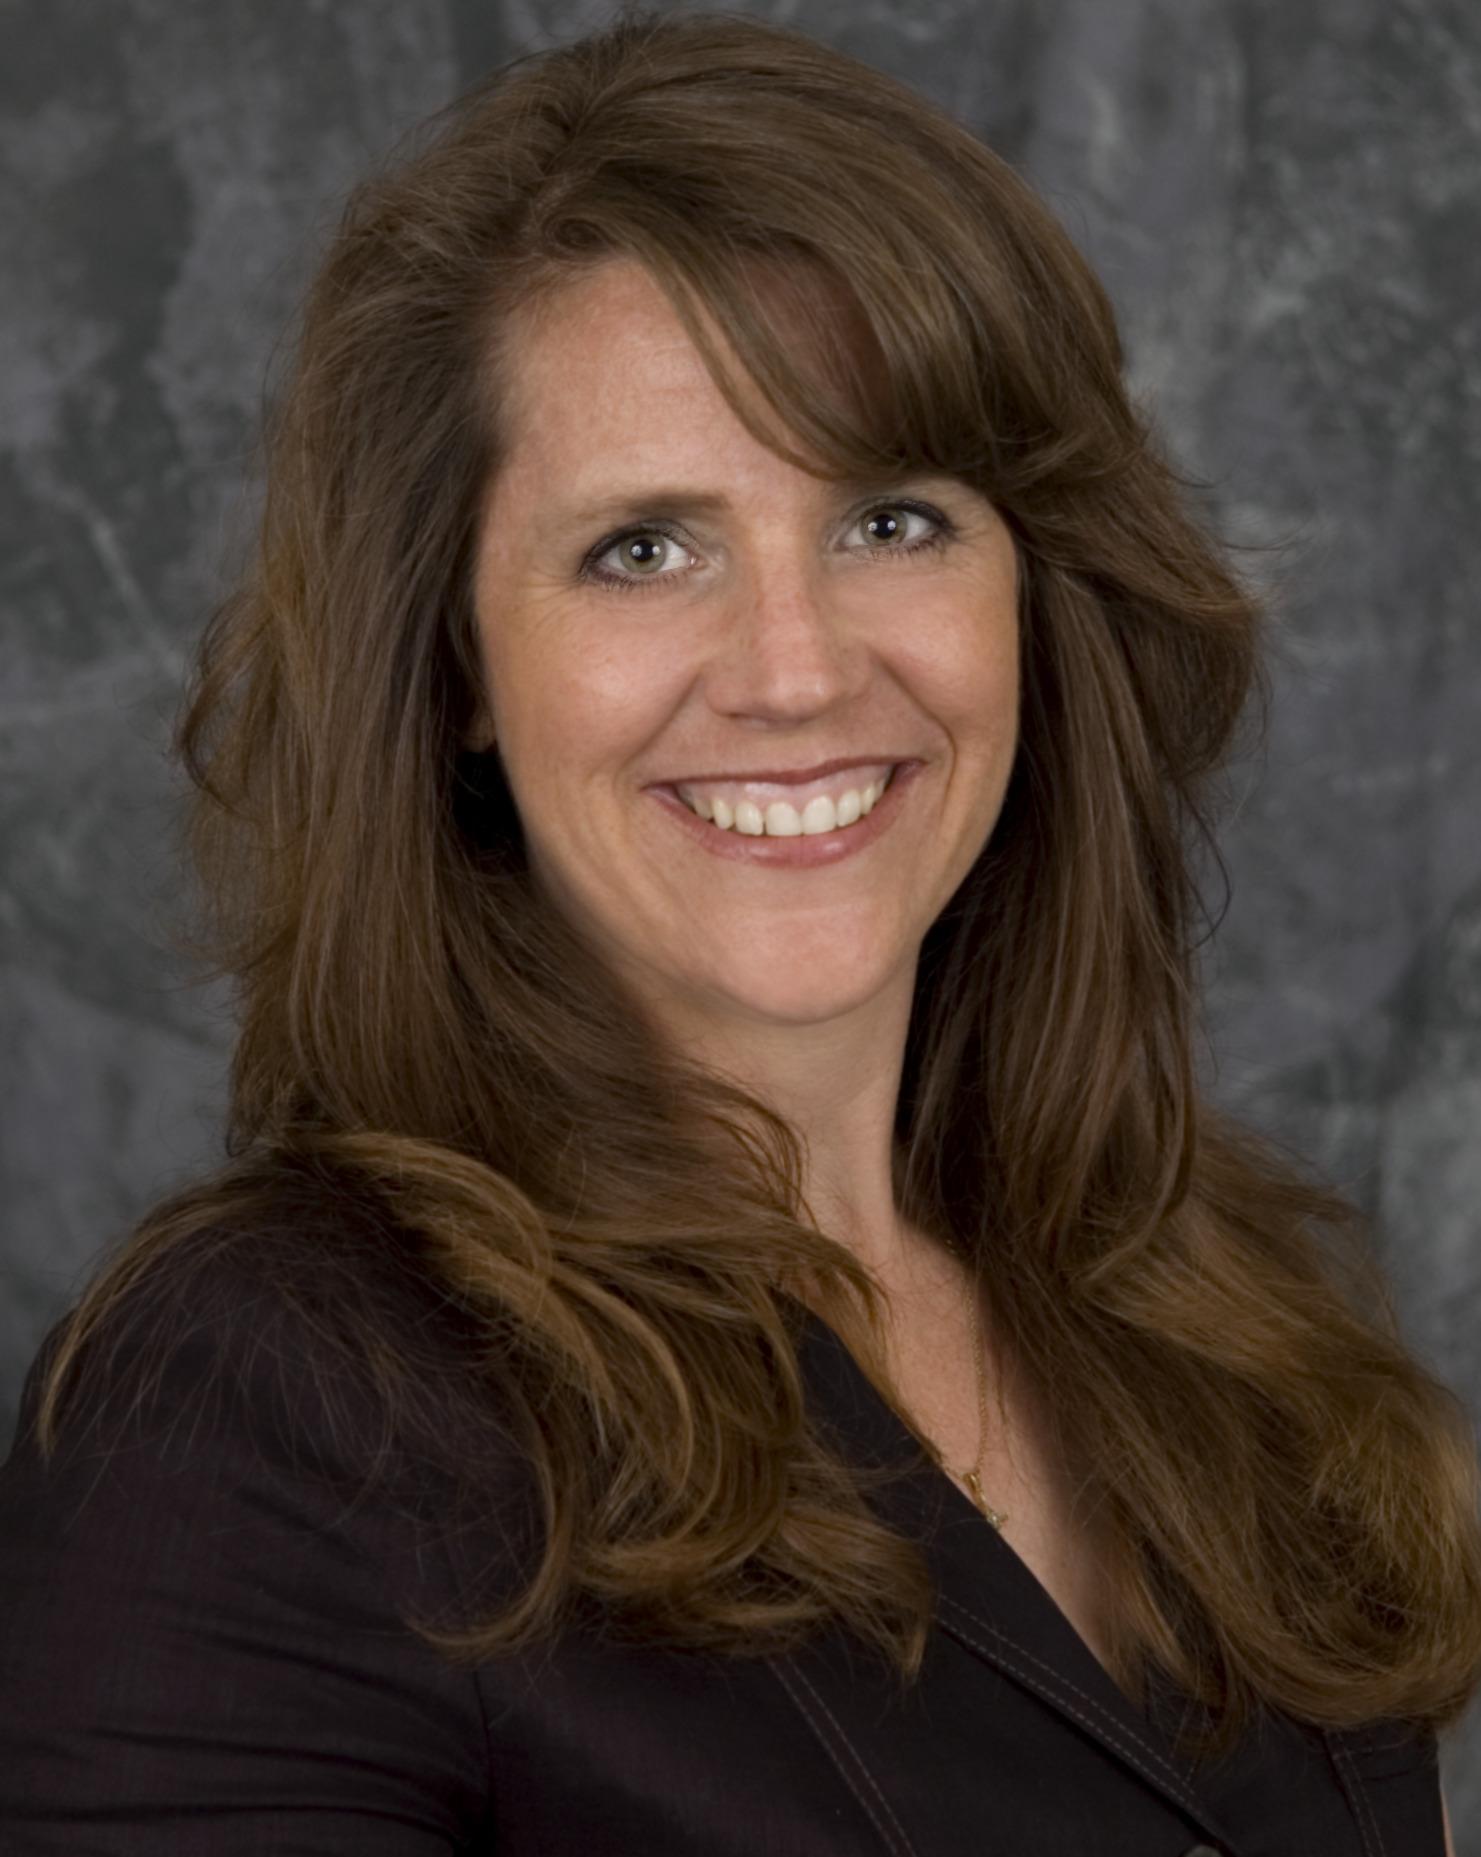 Tammy Ebersole